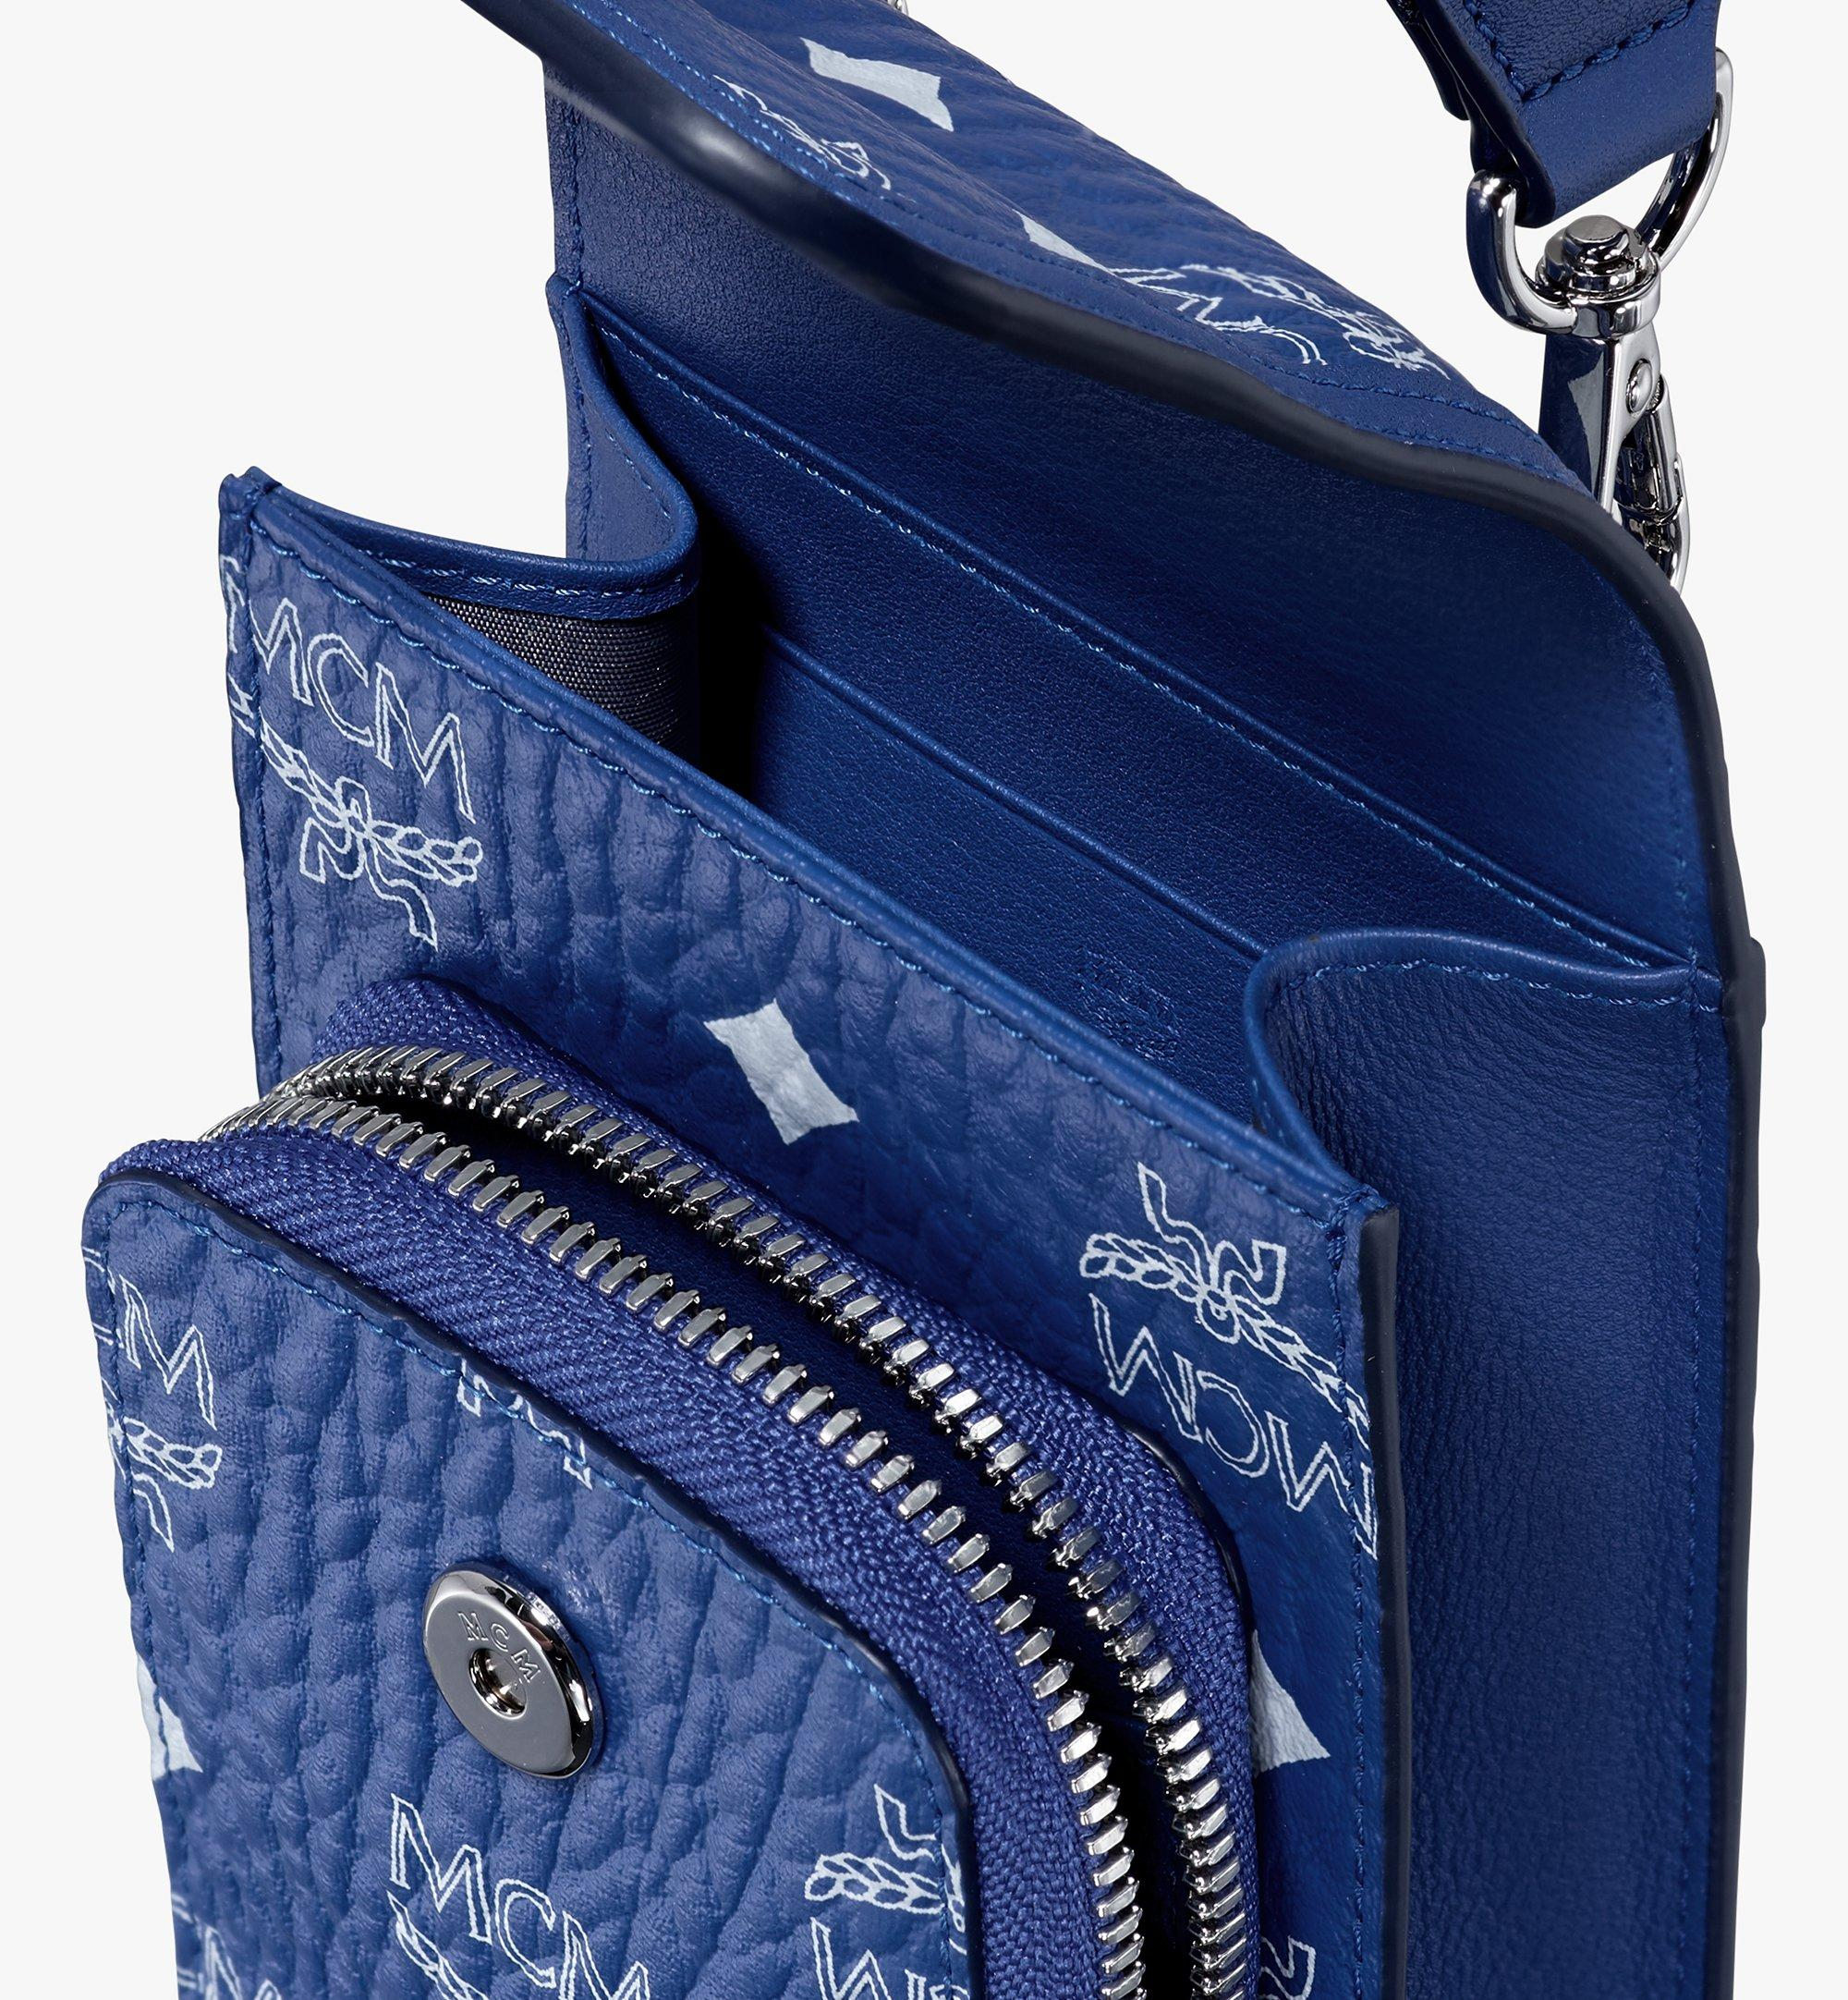 MCM Crossbody Phone Case in Visetos Blue MXEASVI01H1001 Alternate View 4